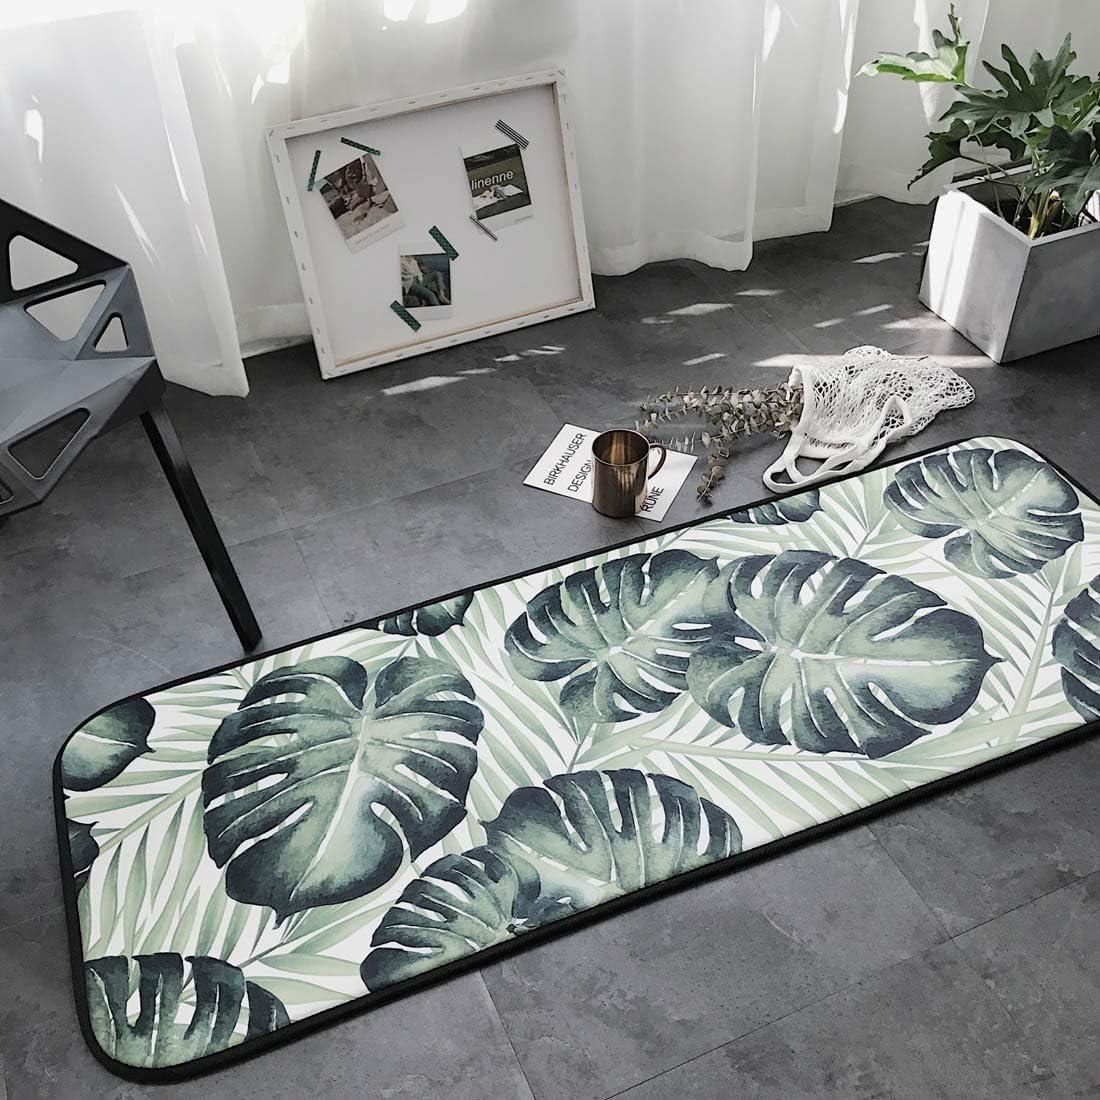 KAROLA Kitchen and Bathroom Mat Rug,Non Skid Mat Entryway Living Room Bedroom Hallway Indoor Floor Entry Decorative Runner Rug Set, 19 x66 ,Monstera